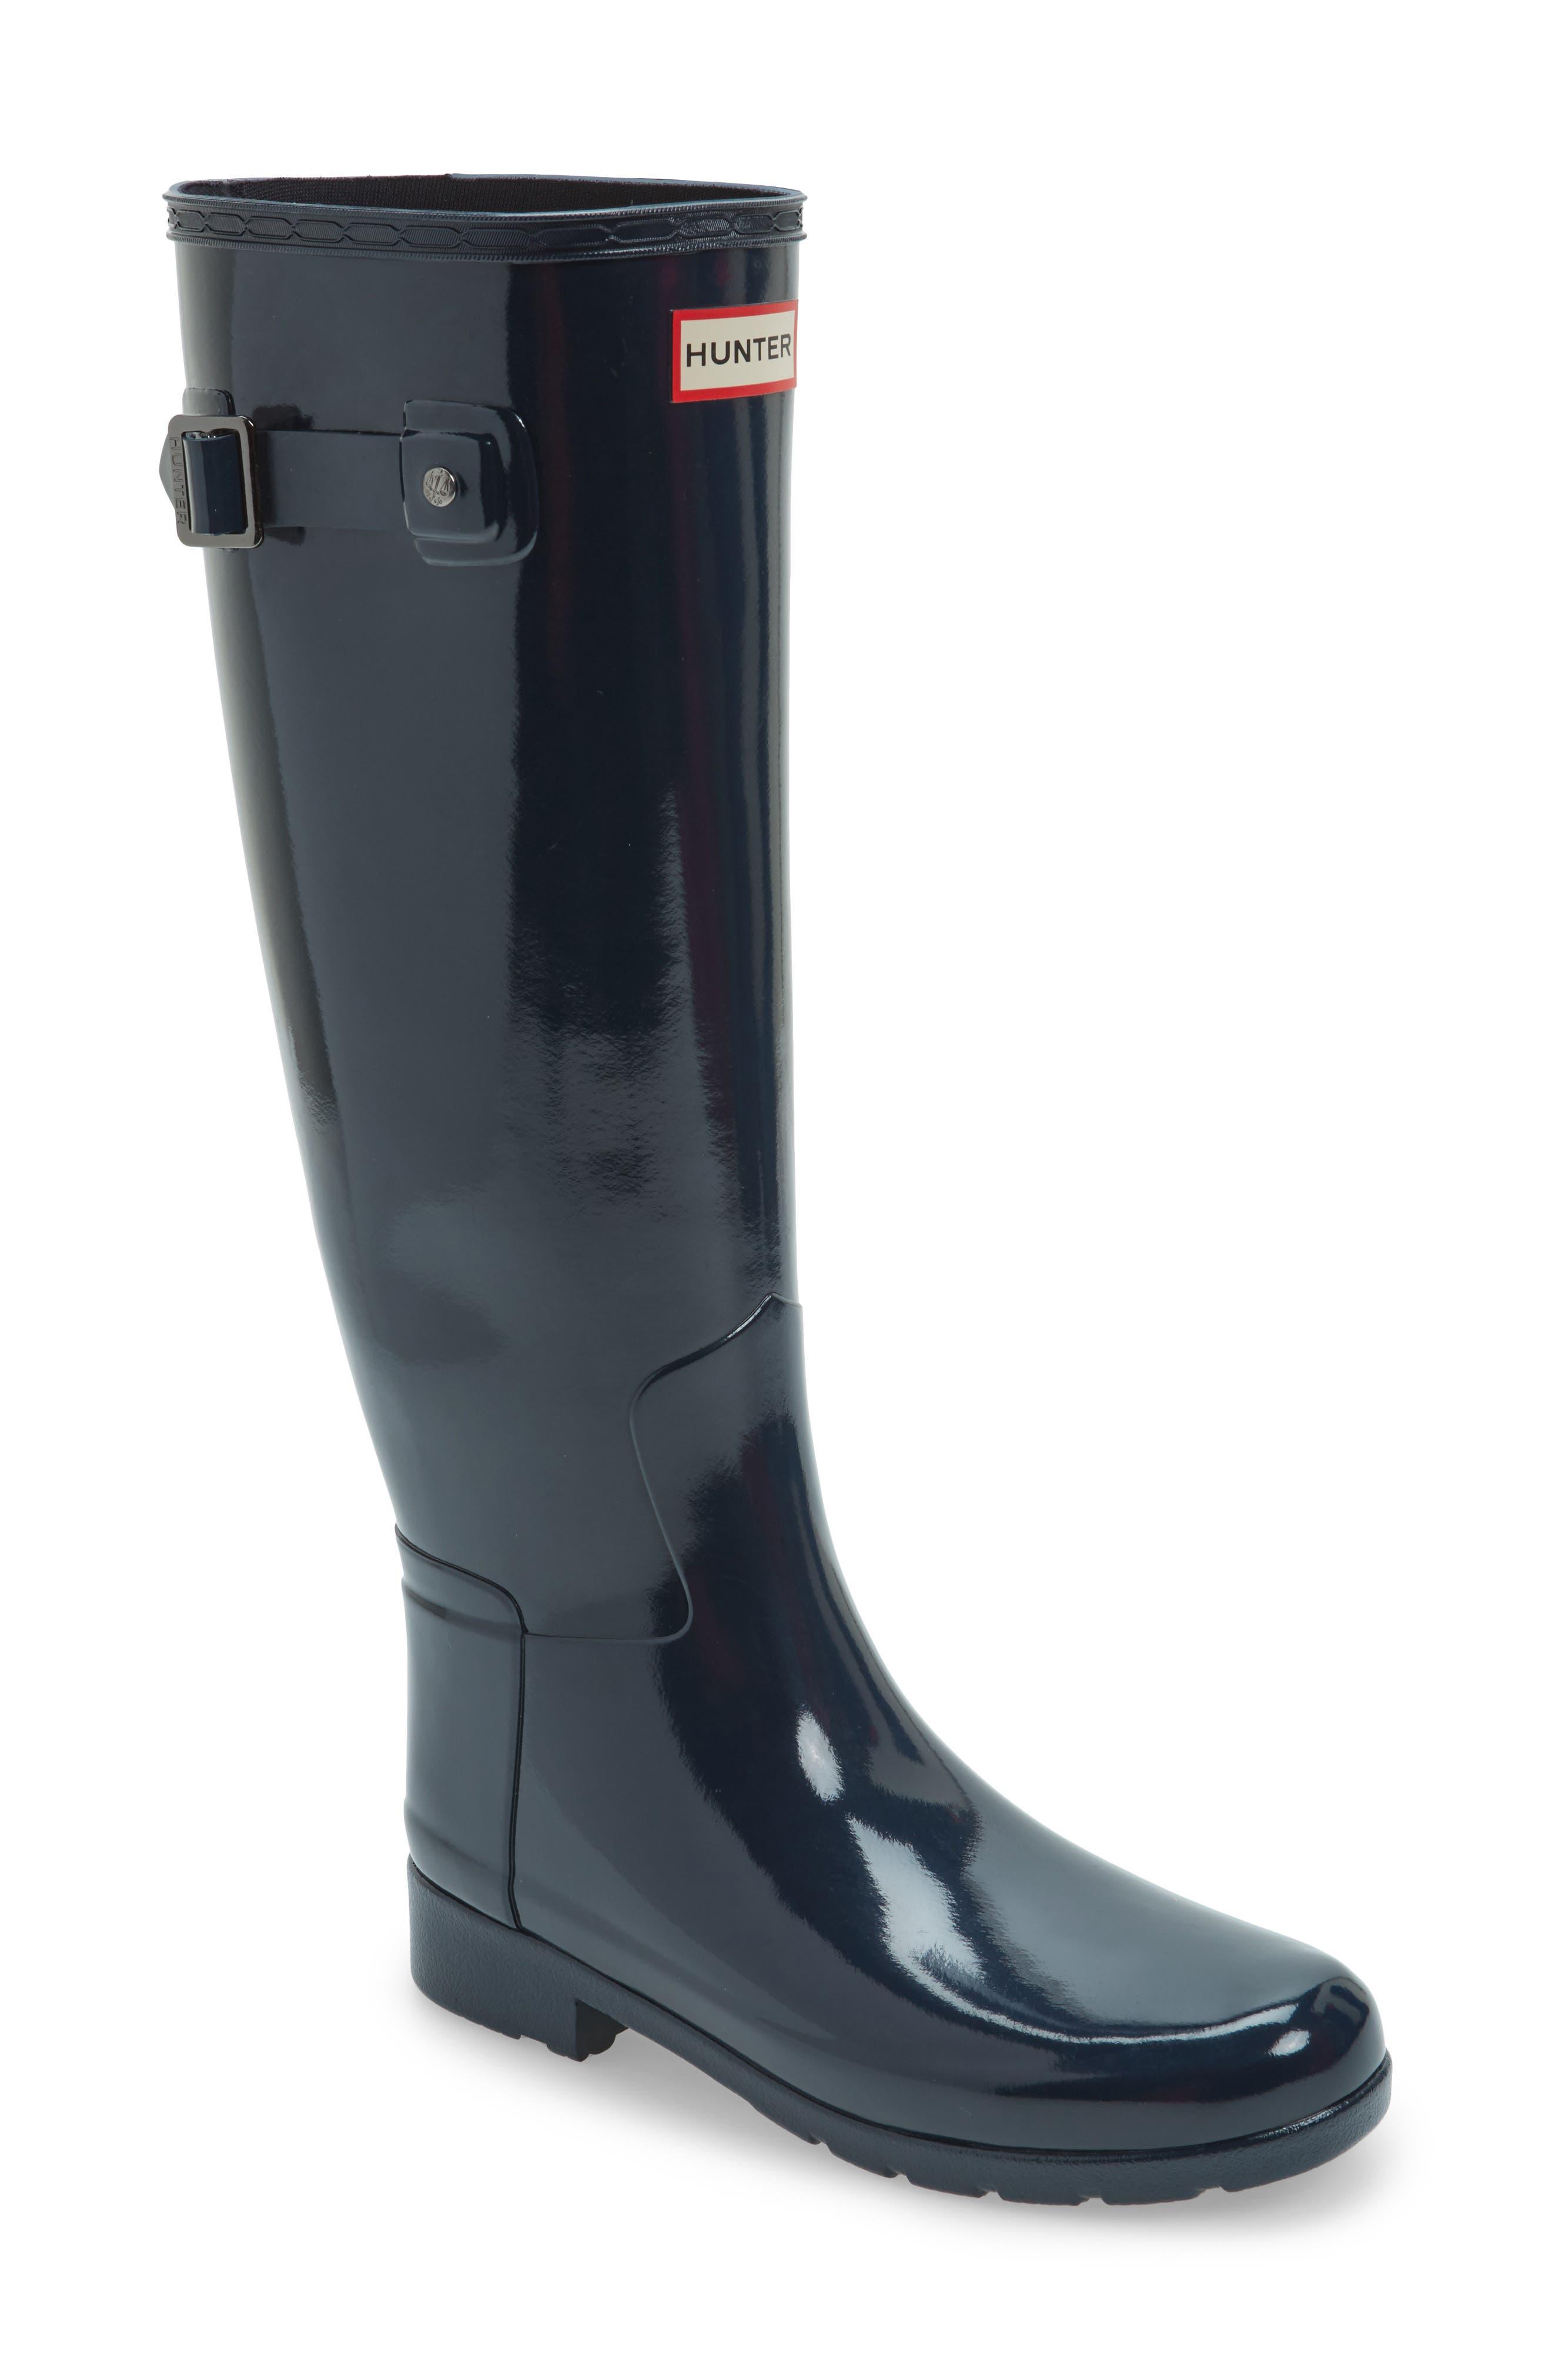 Main Image - Hunter 'Original Refined' High Gloss Rain Boot (Women)